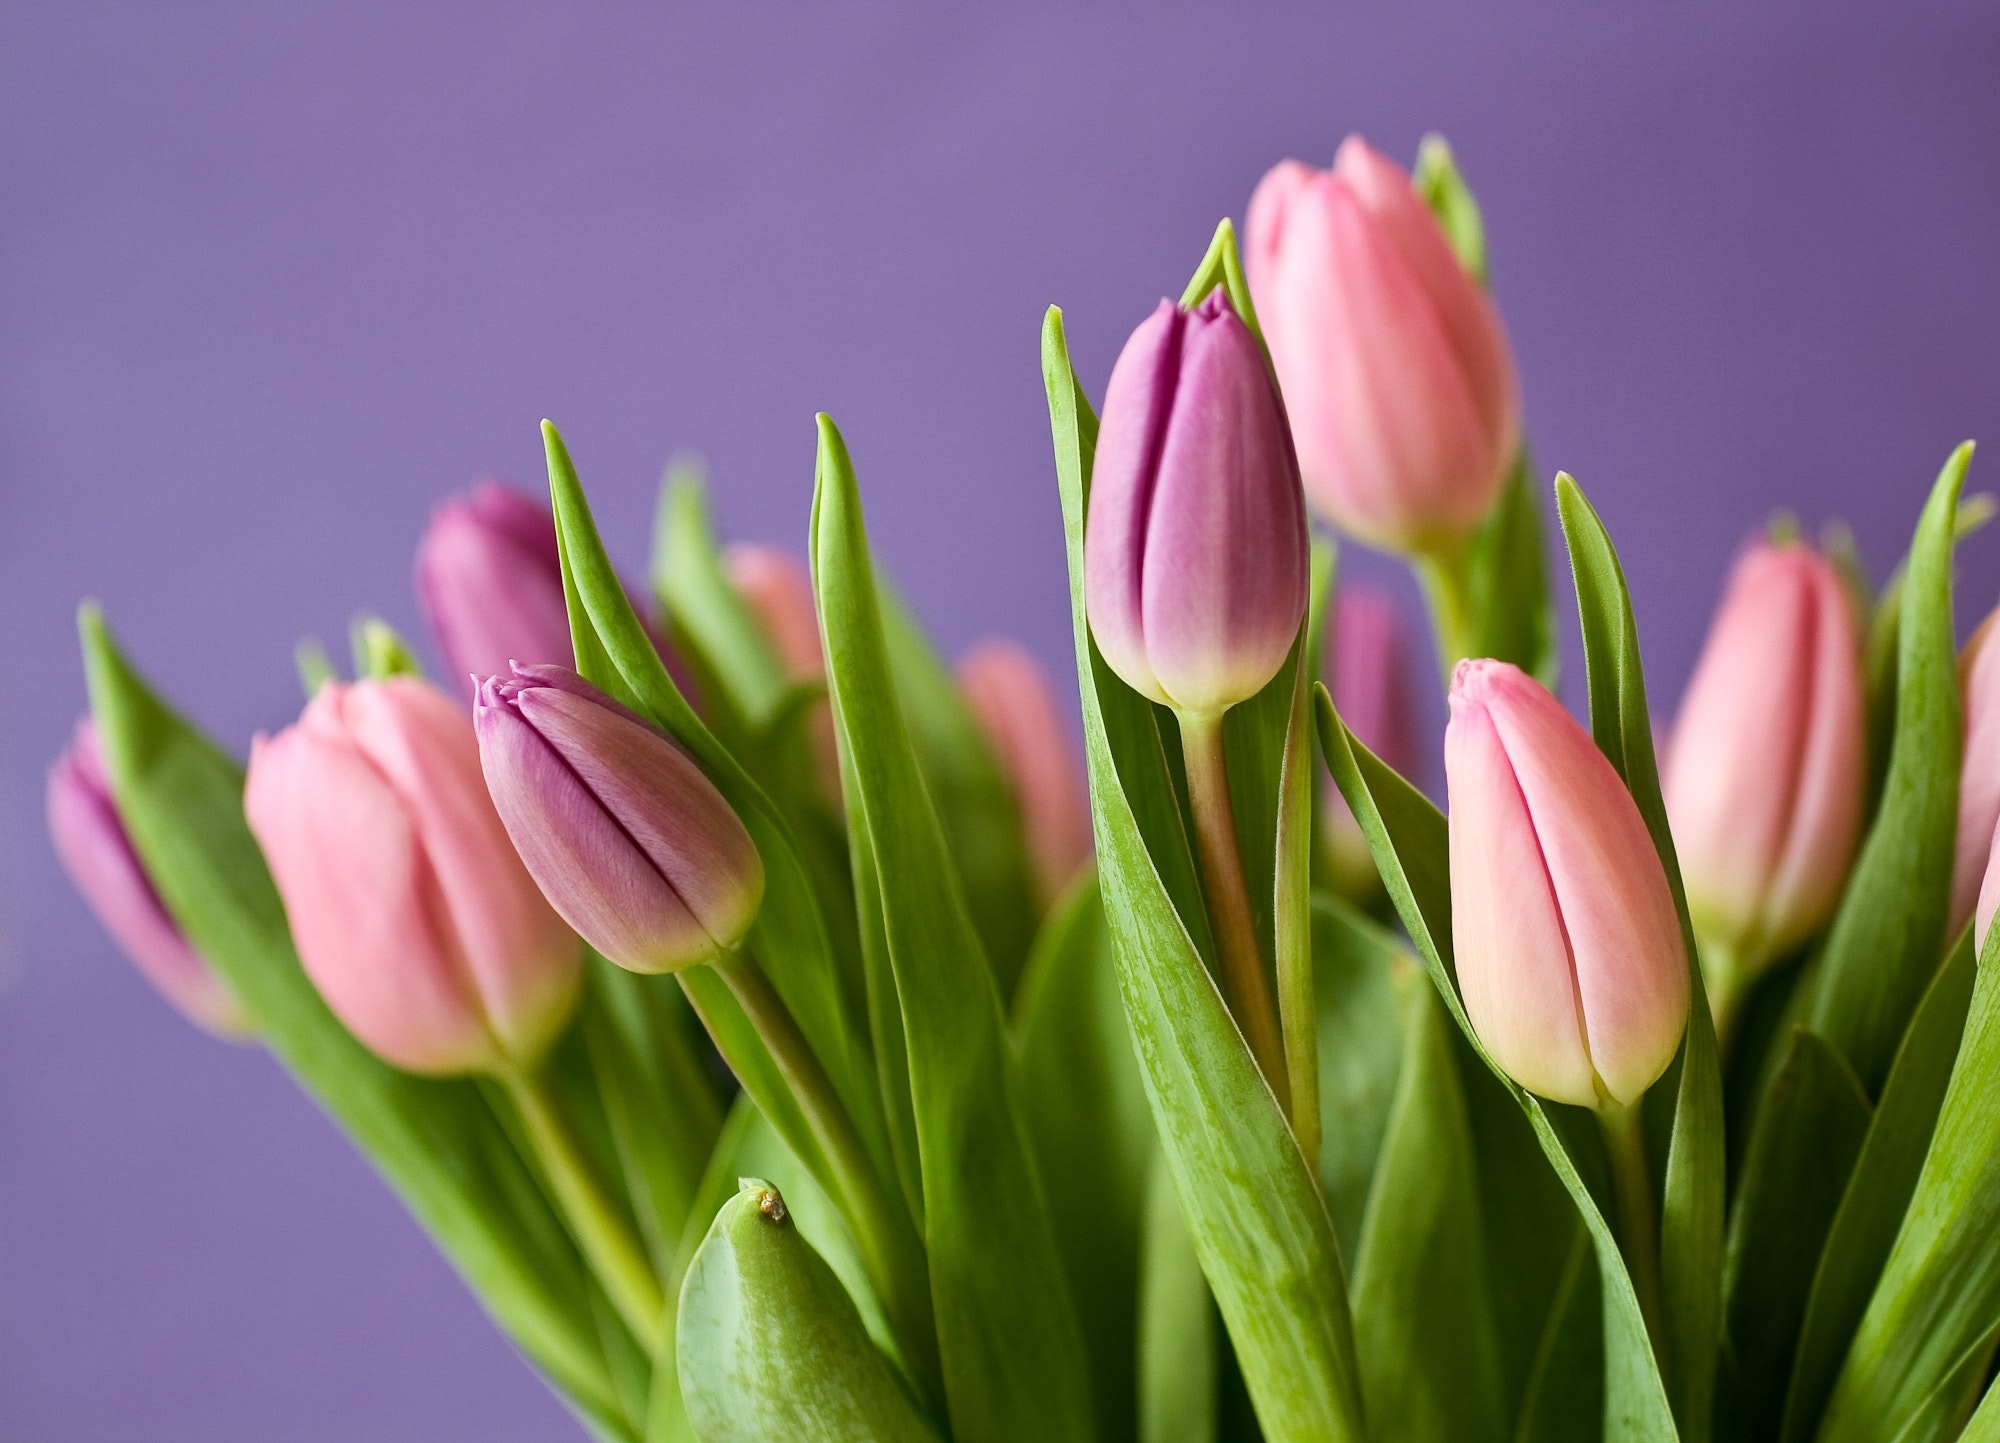 Florist in ann arbor lilys flowers in saline saline izmirmasajfo